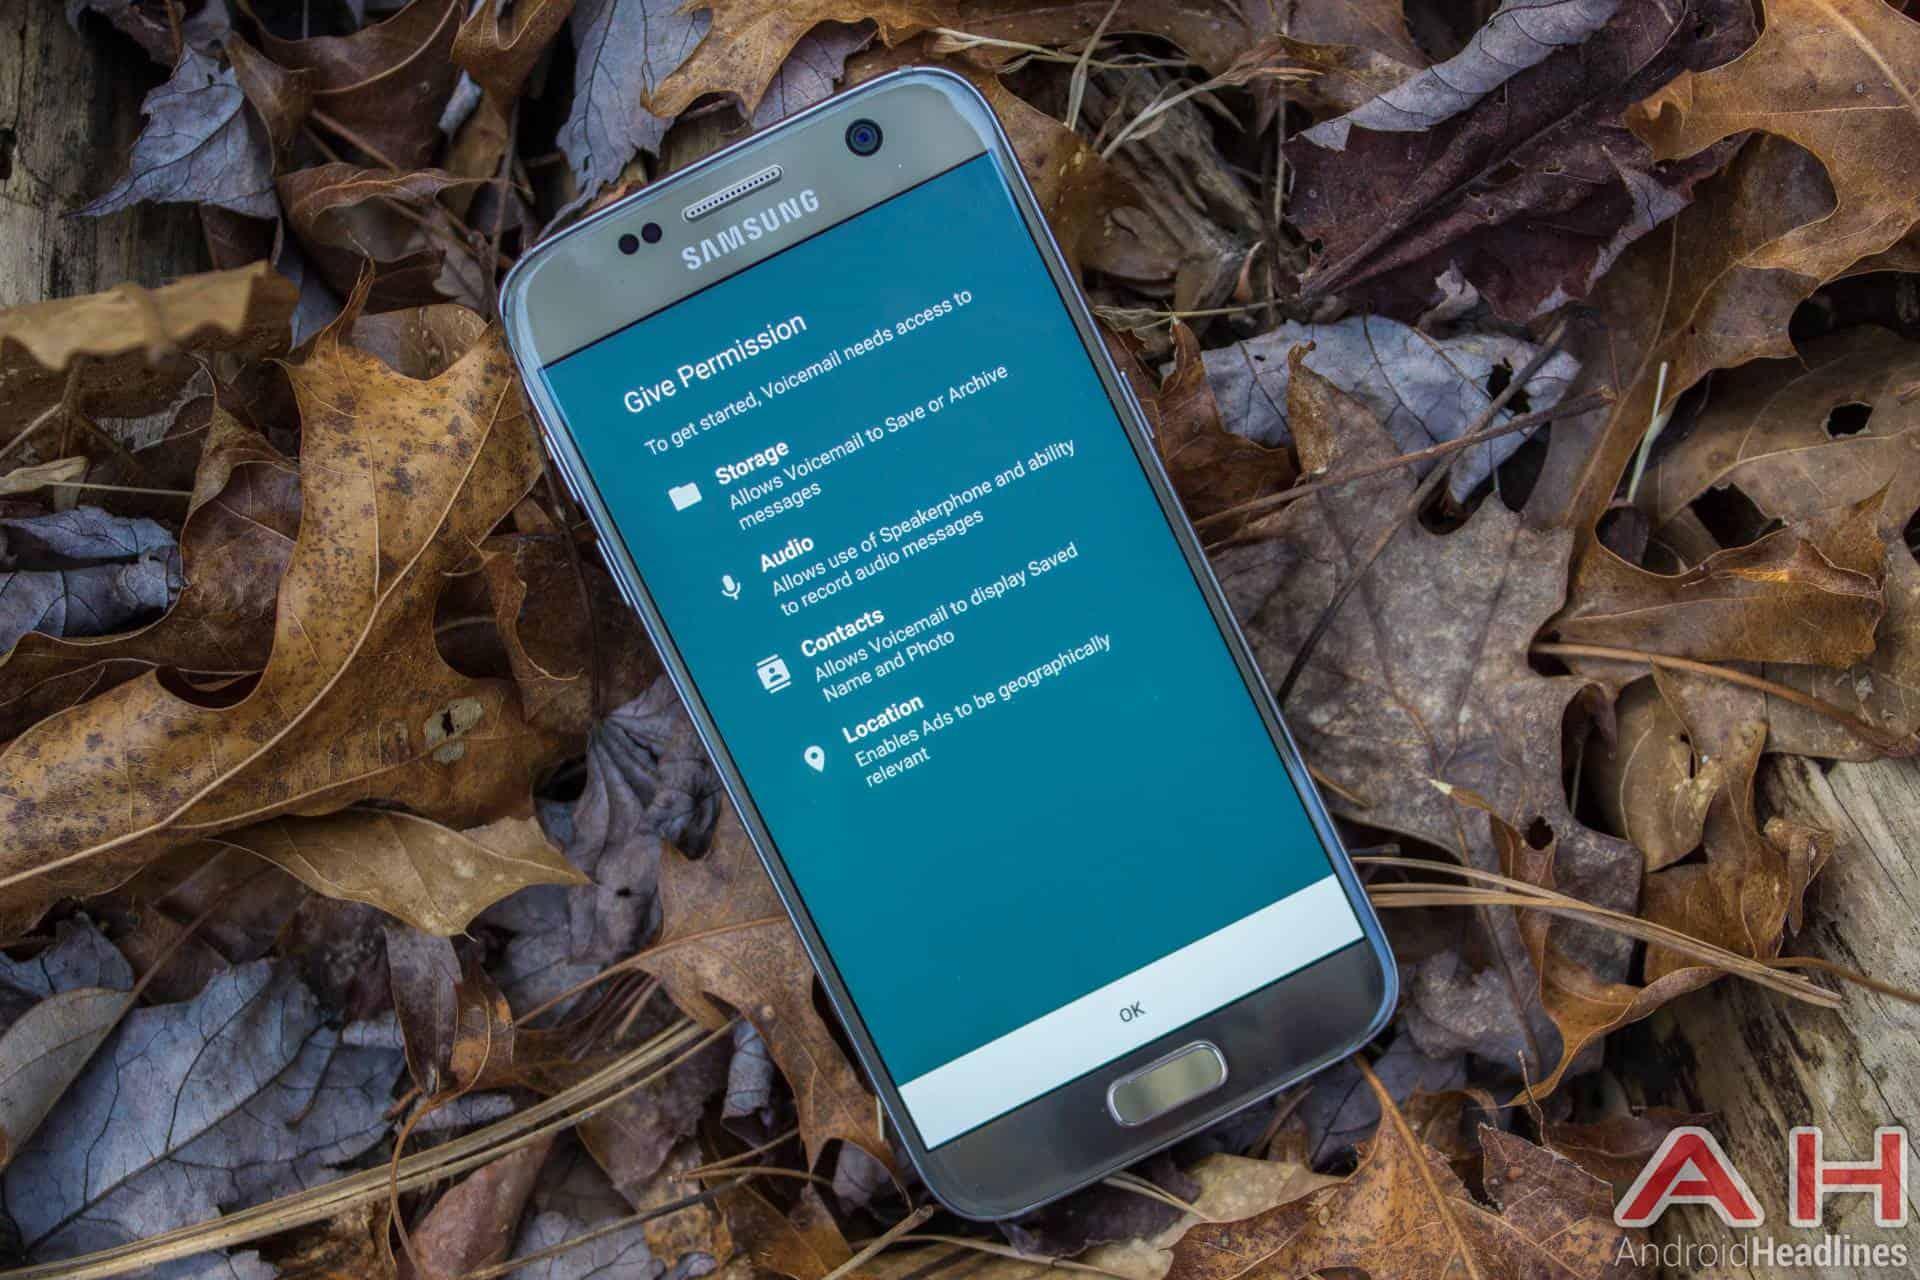 Samsung Galaxy S7 Gold AH NS app permissions